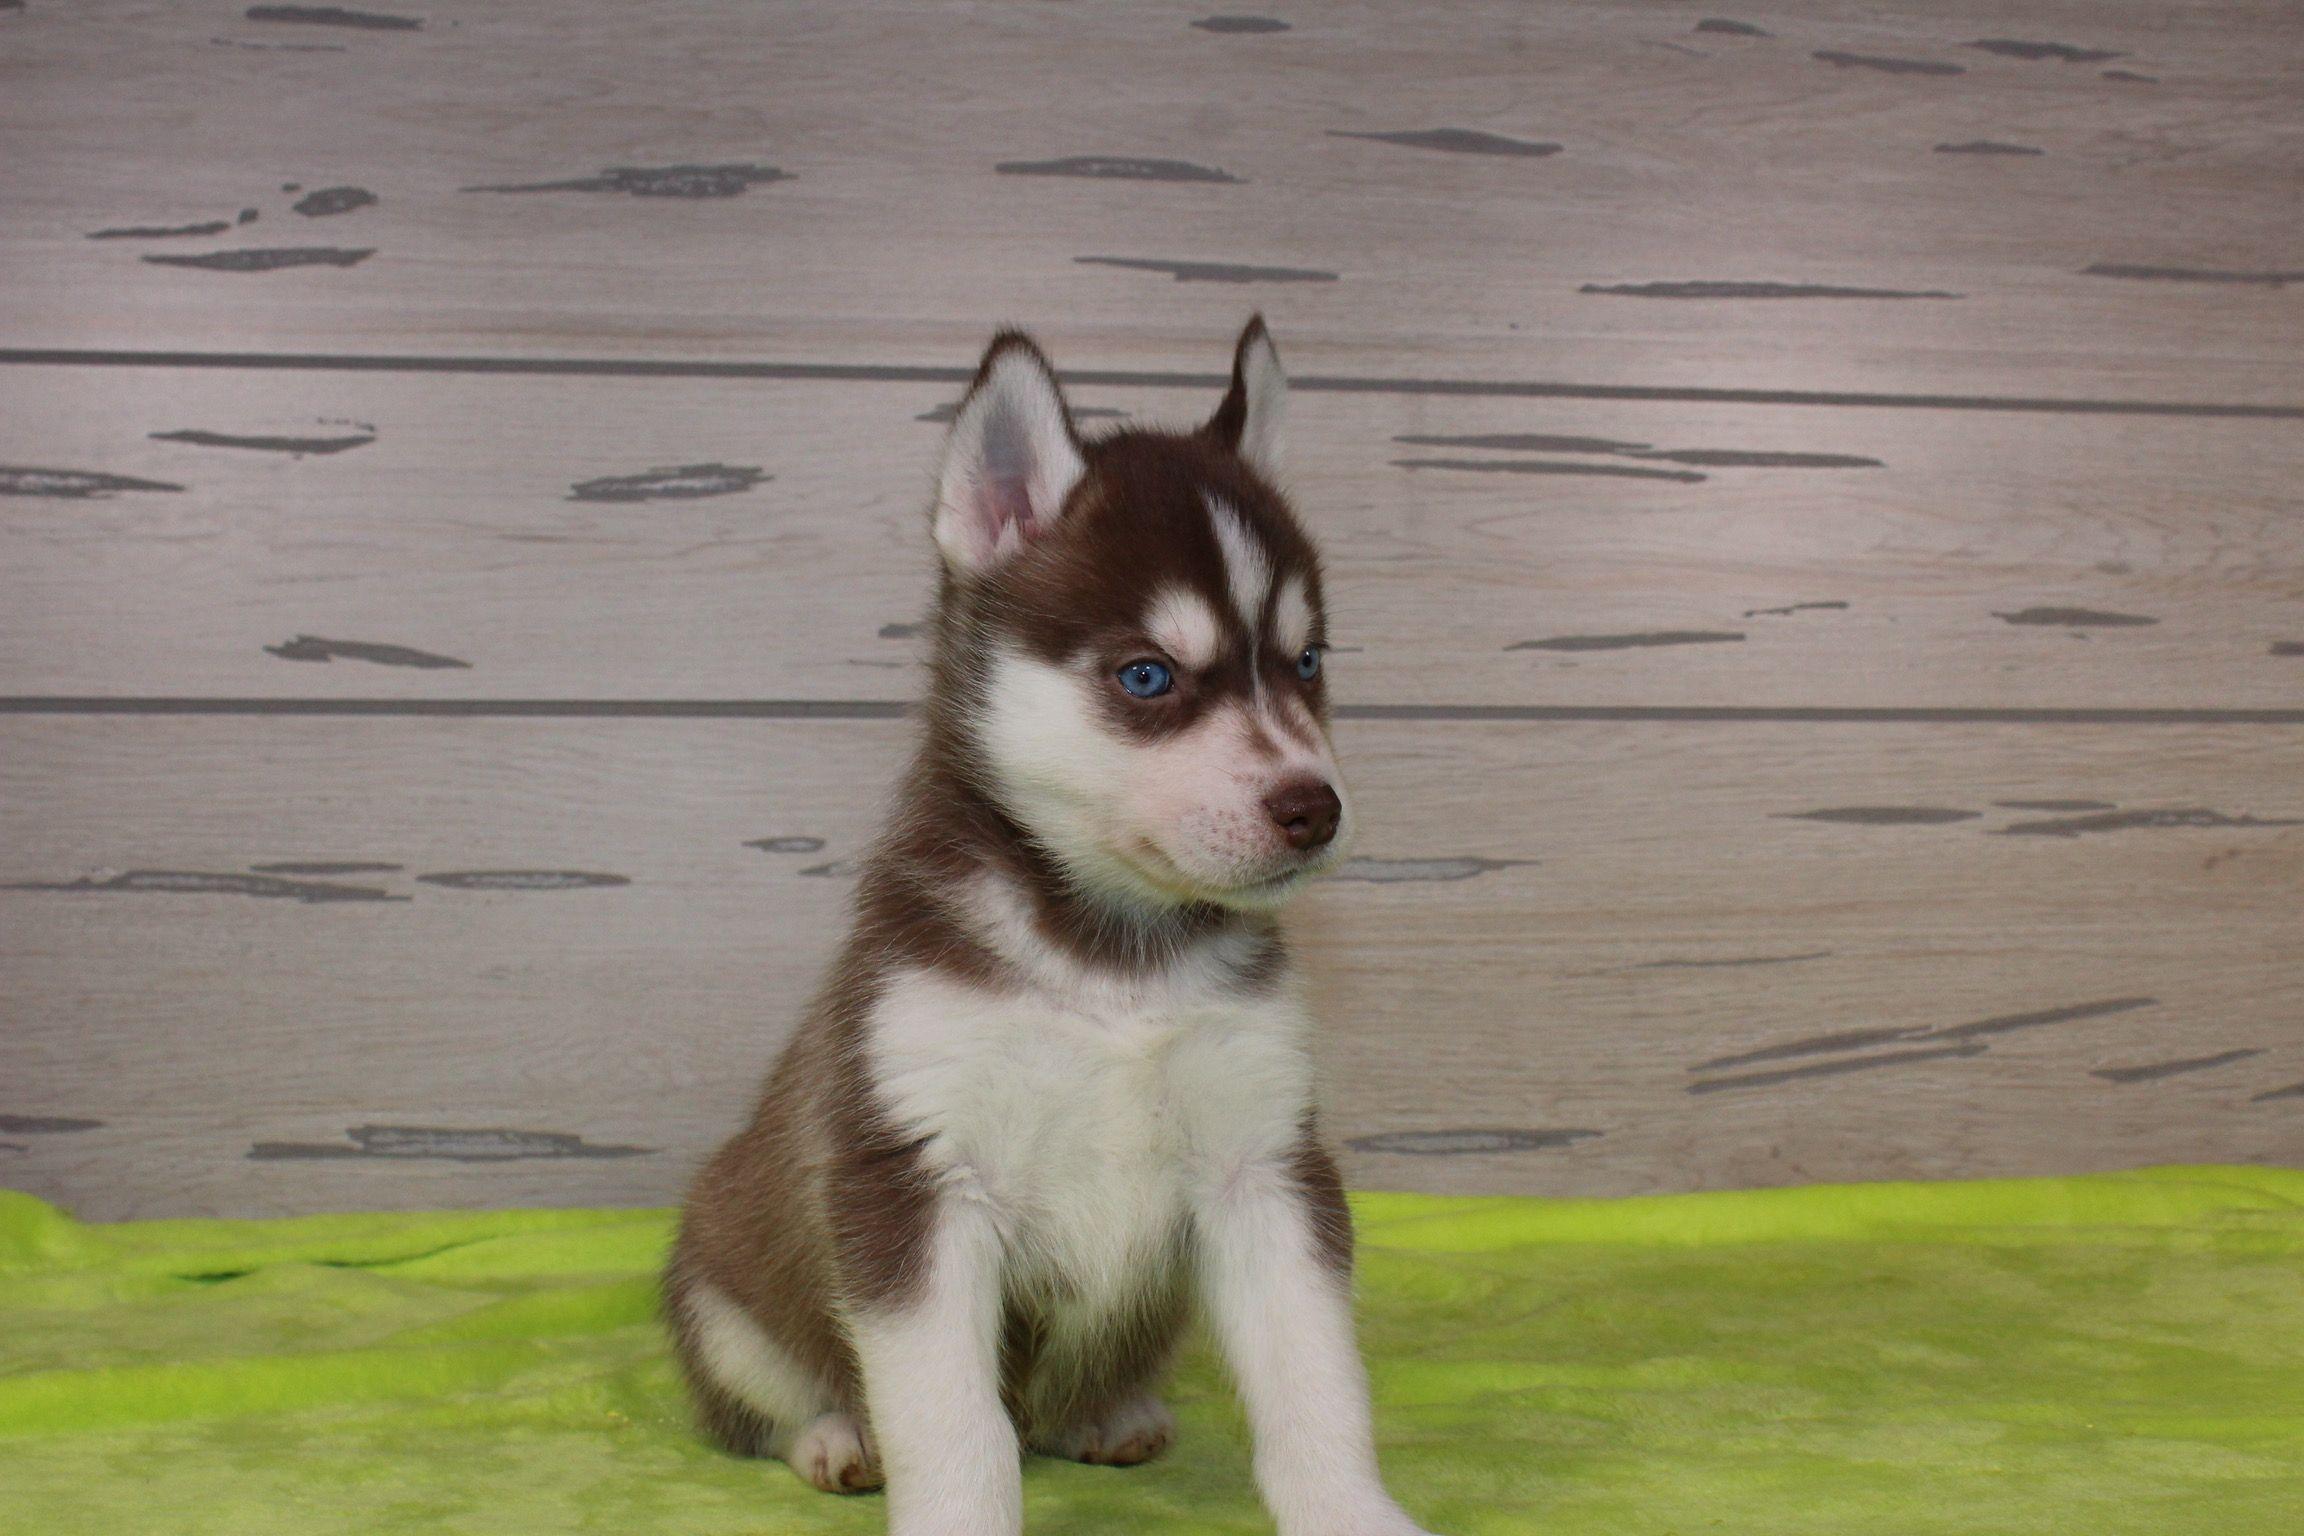 Simba Kolu Husky Puppy For Sale Nappanee Indiana Vip Puppies Husky Puppies For Sale Pomsky Puppies Puppies